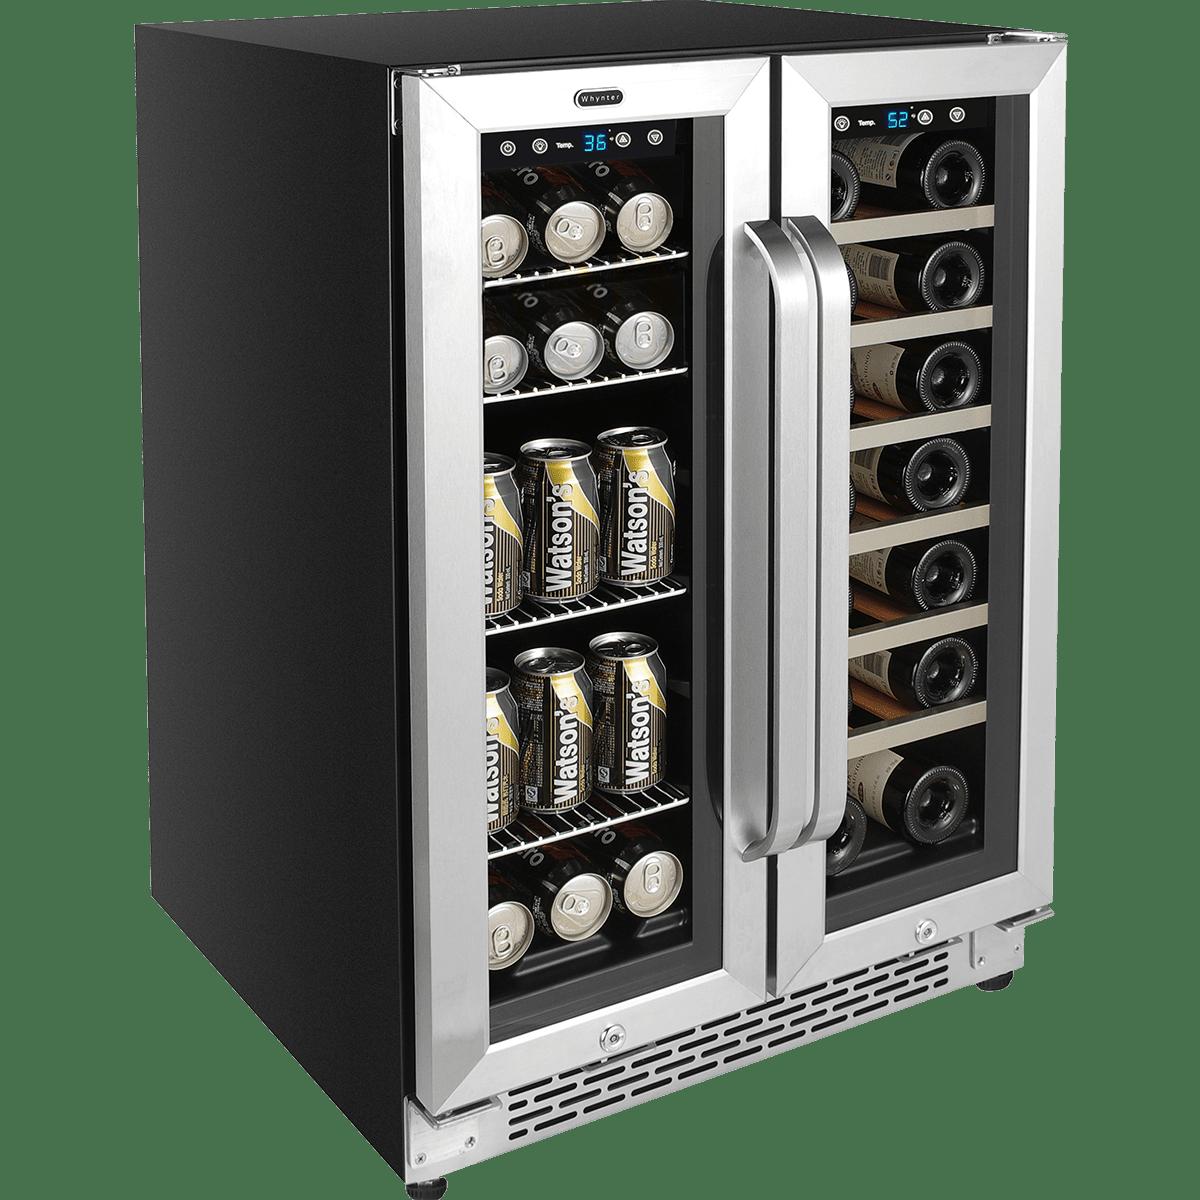 Whynter Built-In French Door Dual Zone Wine Cooler Beverage Cooler (BWB- 801c41129